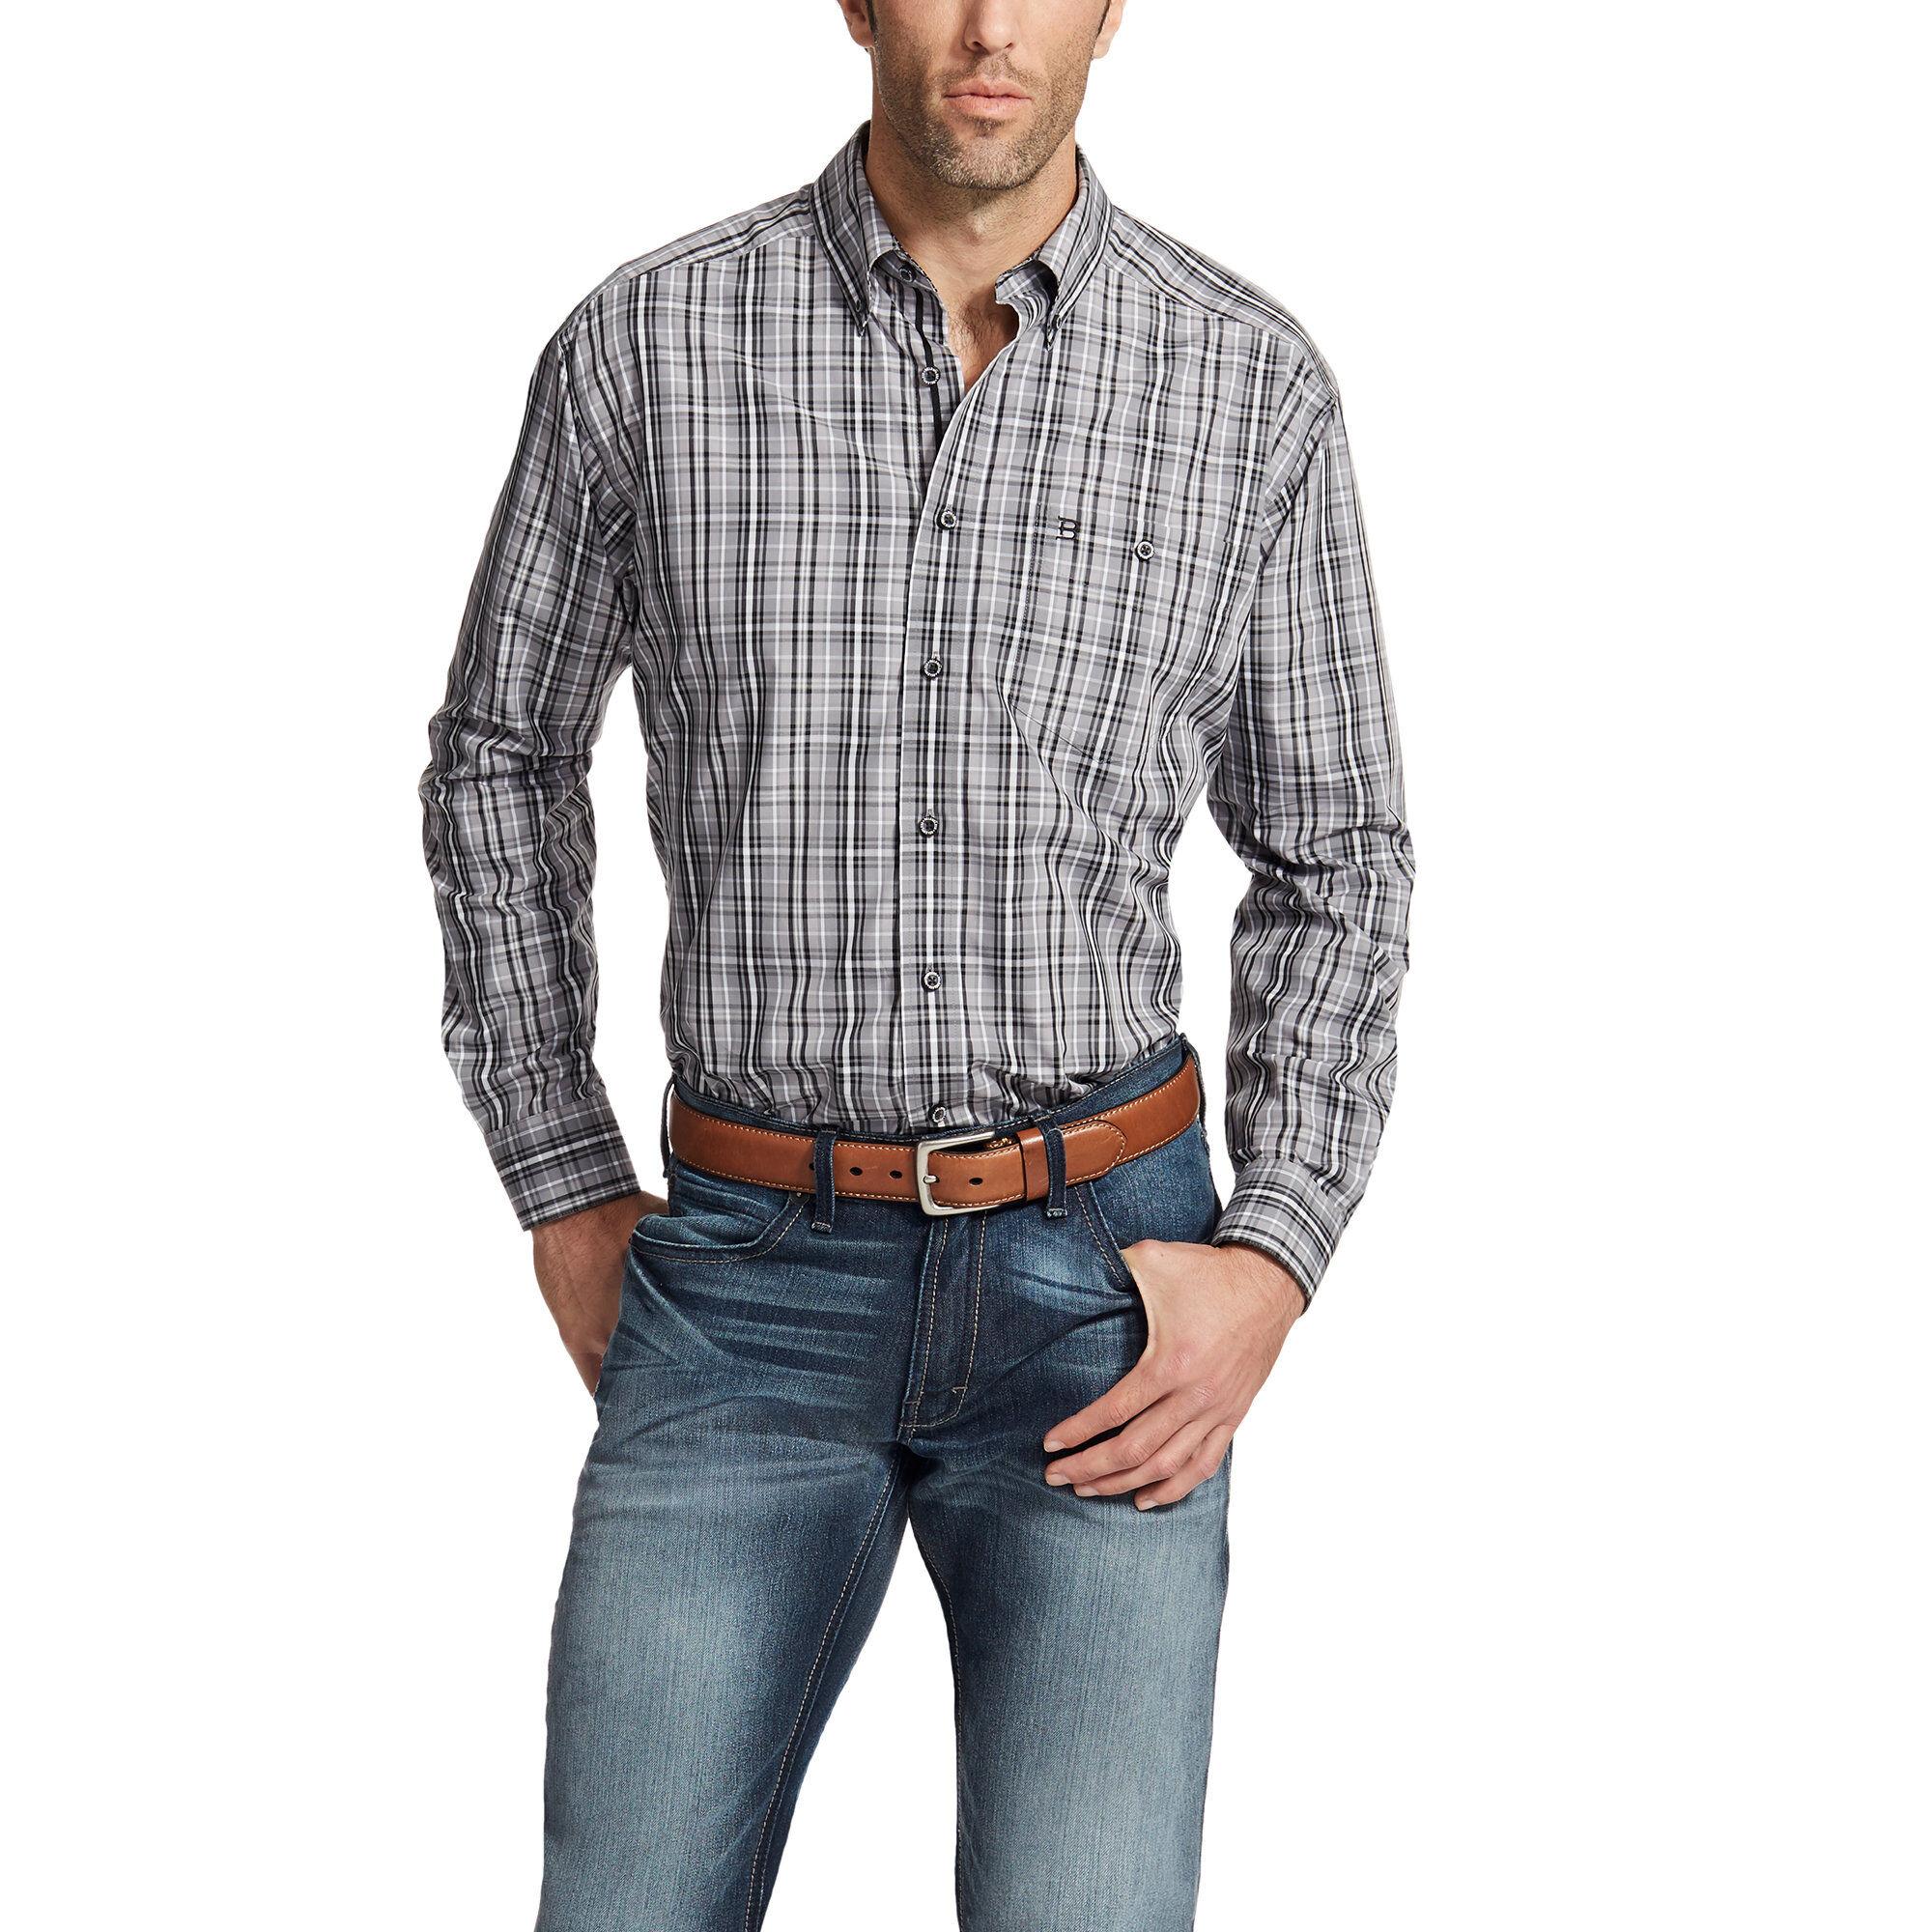 Relentless Fortitude Shirt